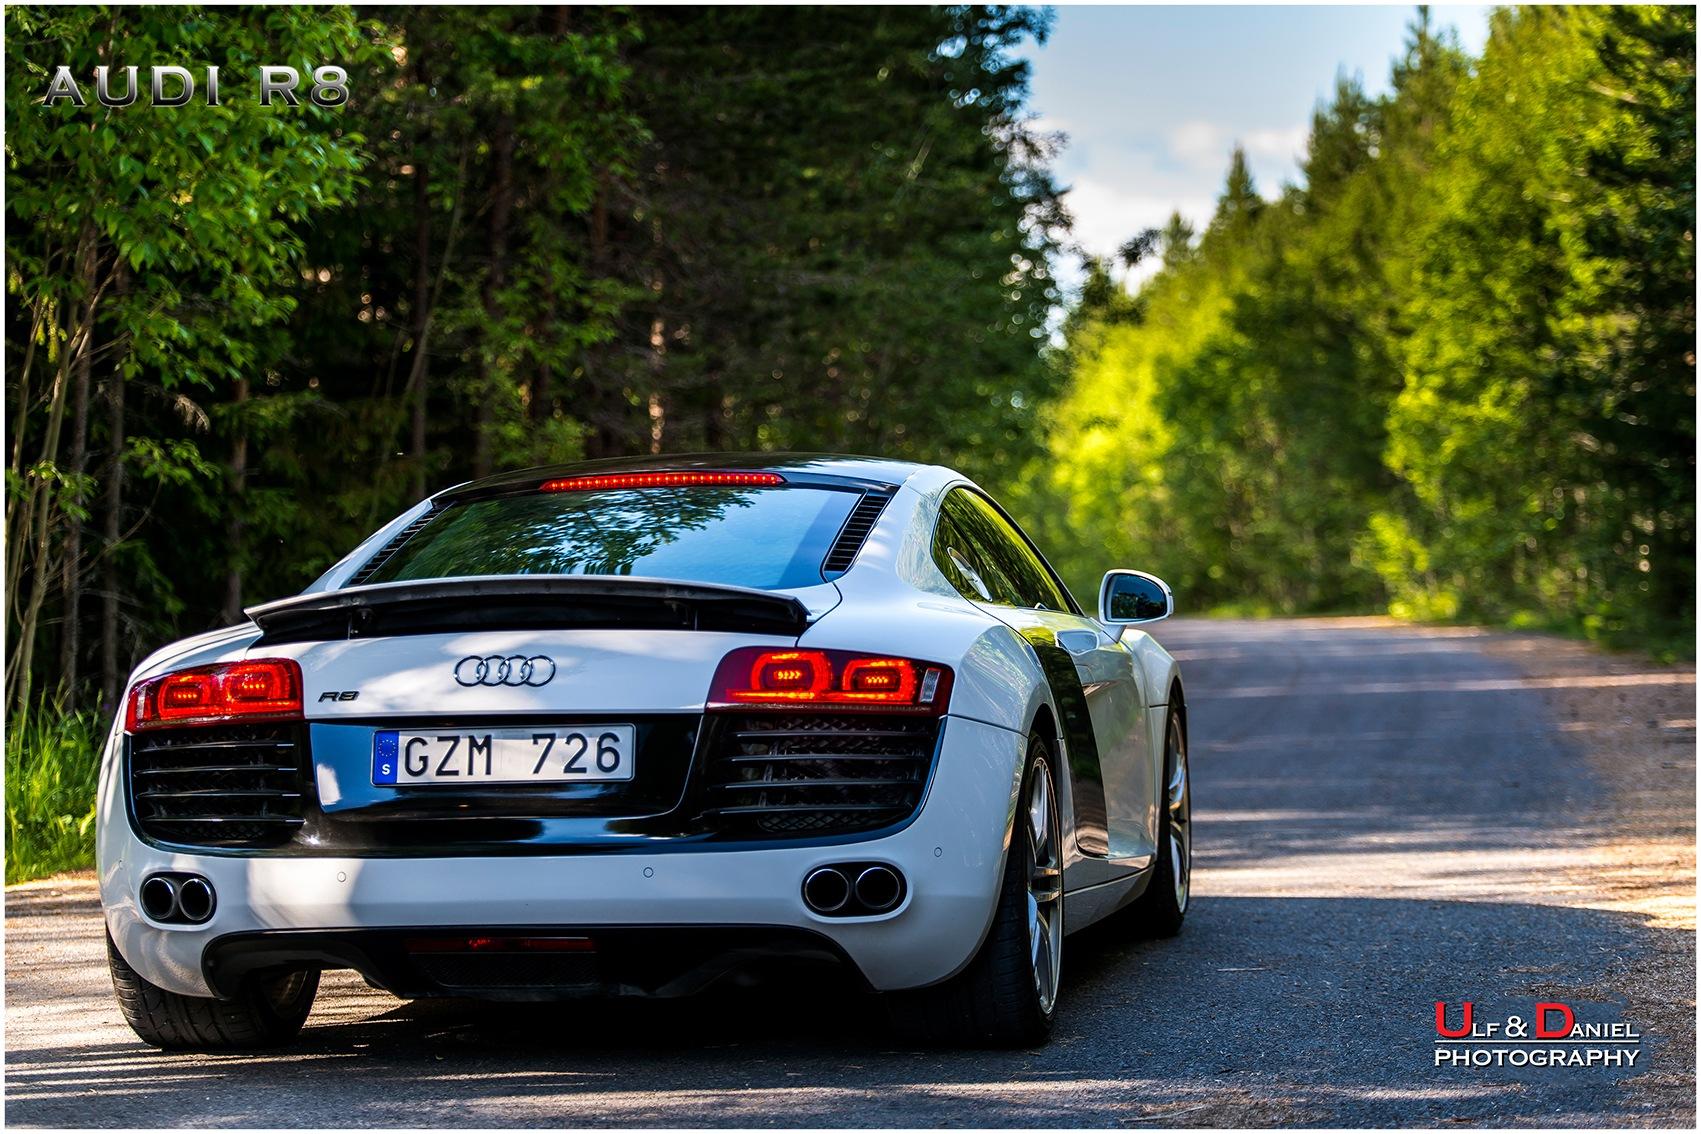 Audi R8 by uffeo56